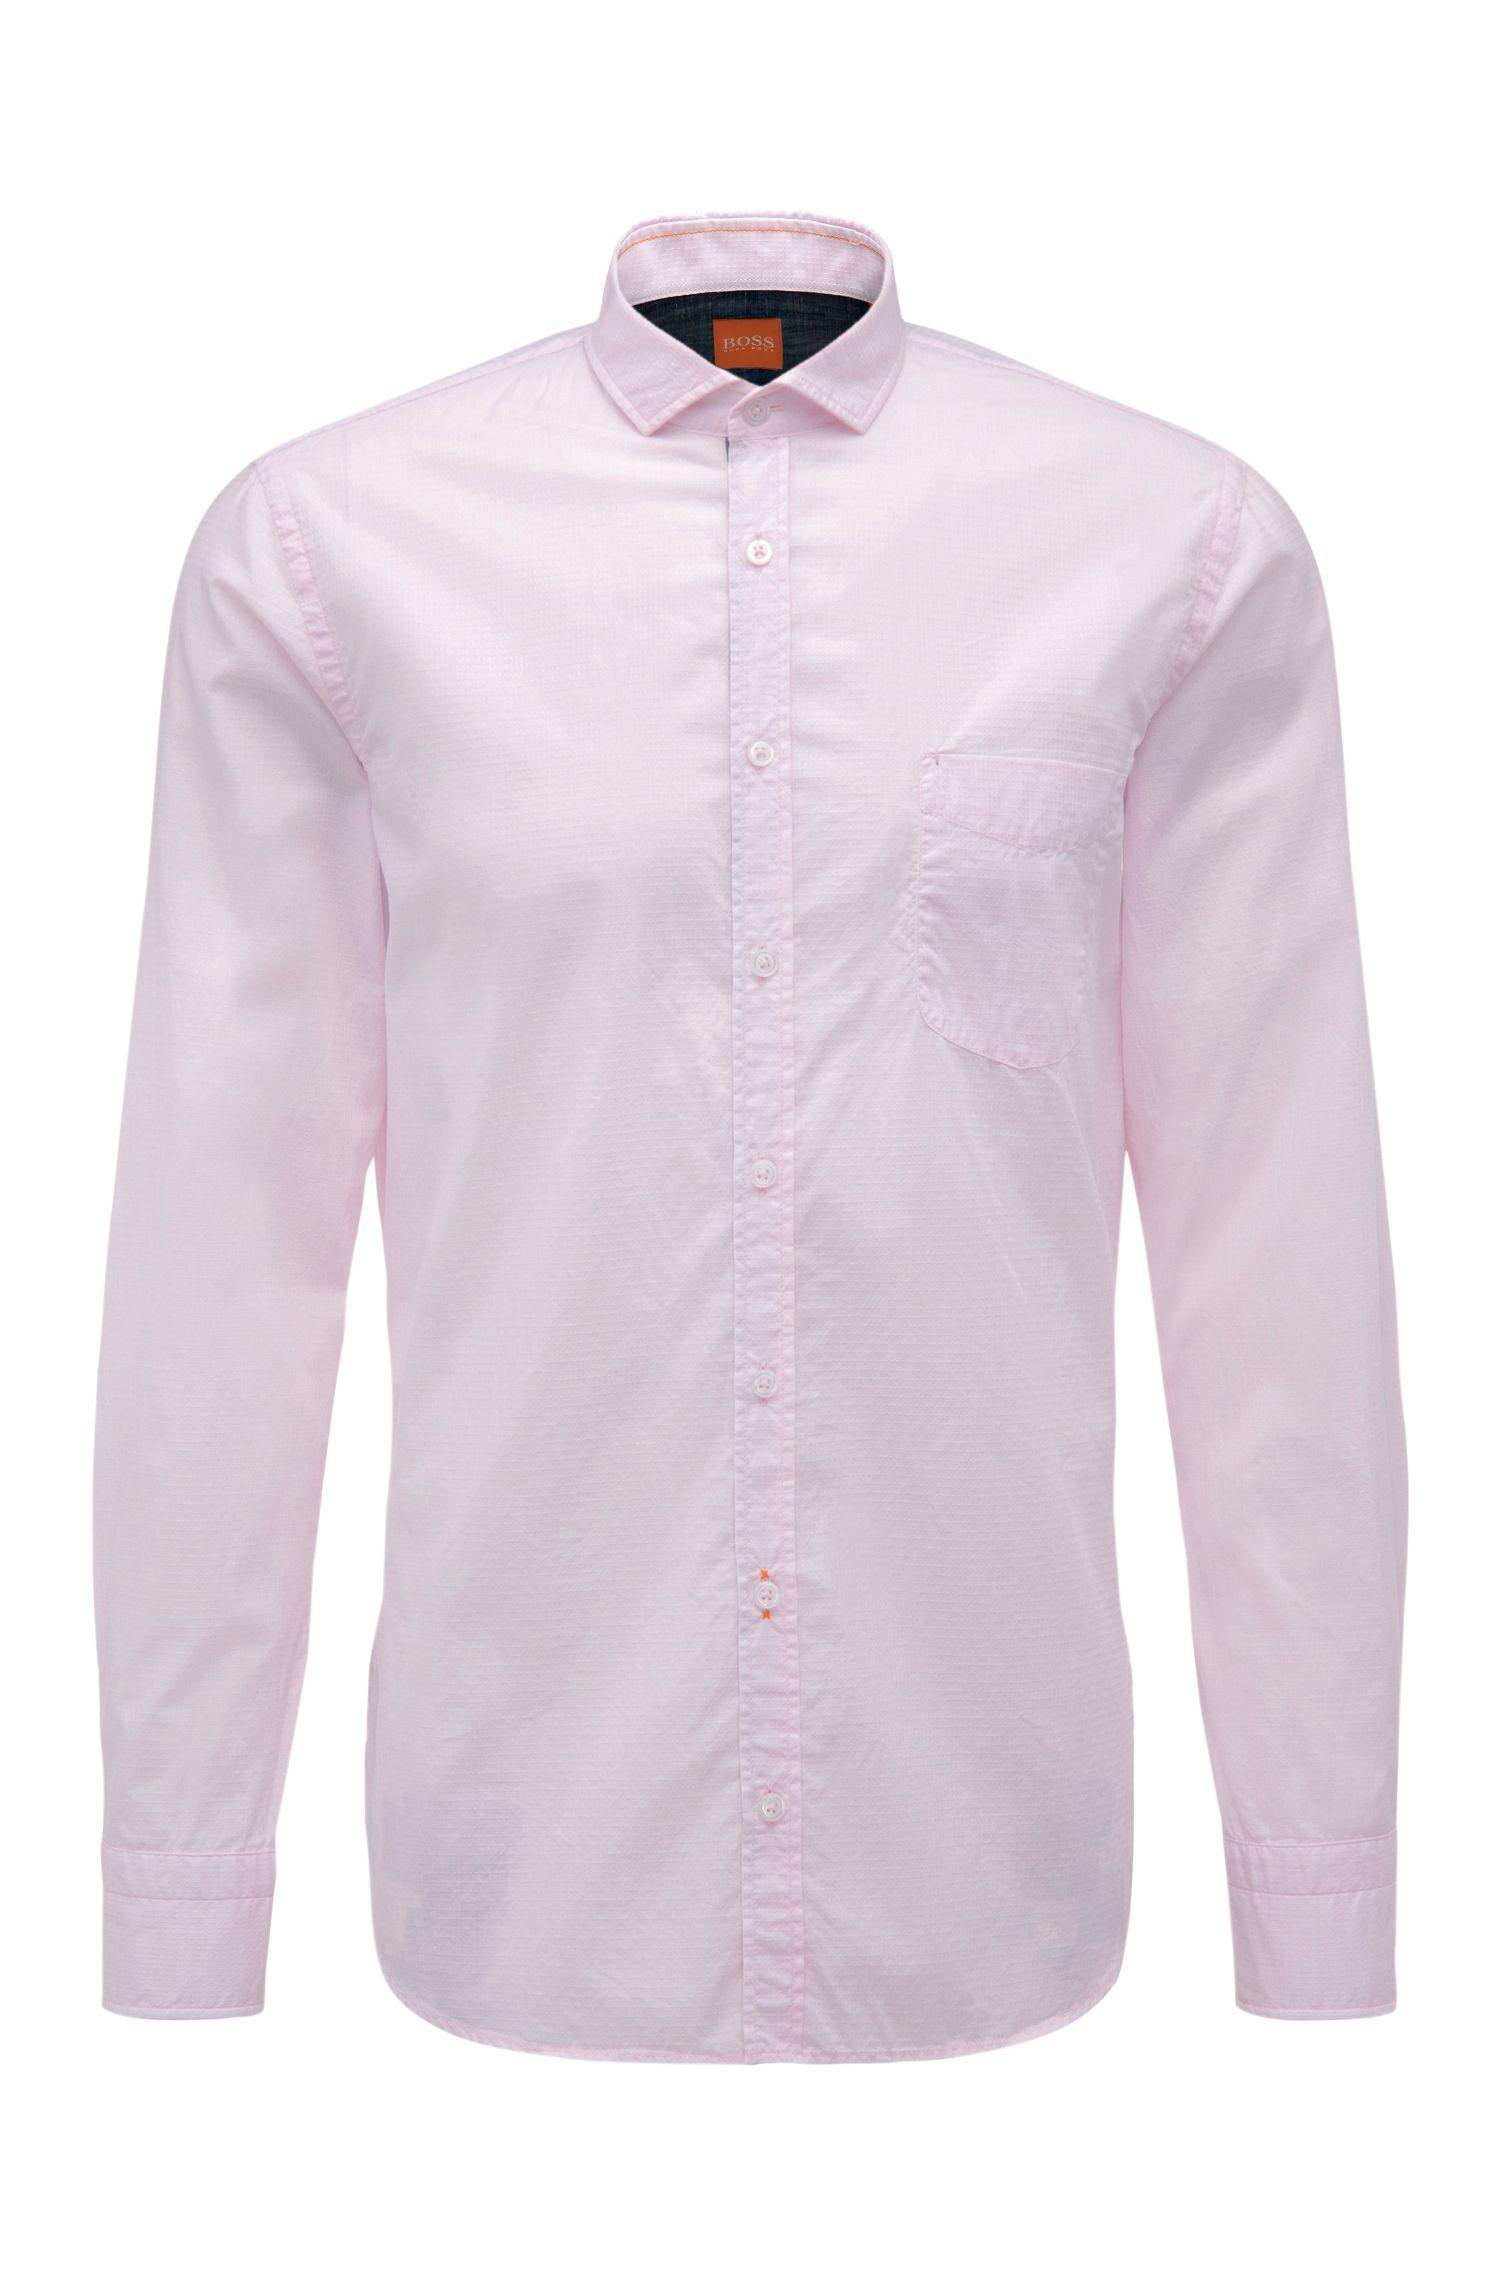 'Cattitude'   Slim Fit, Cotton Button Down Shirt